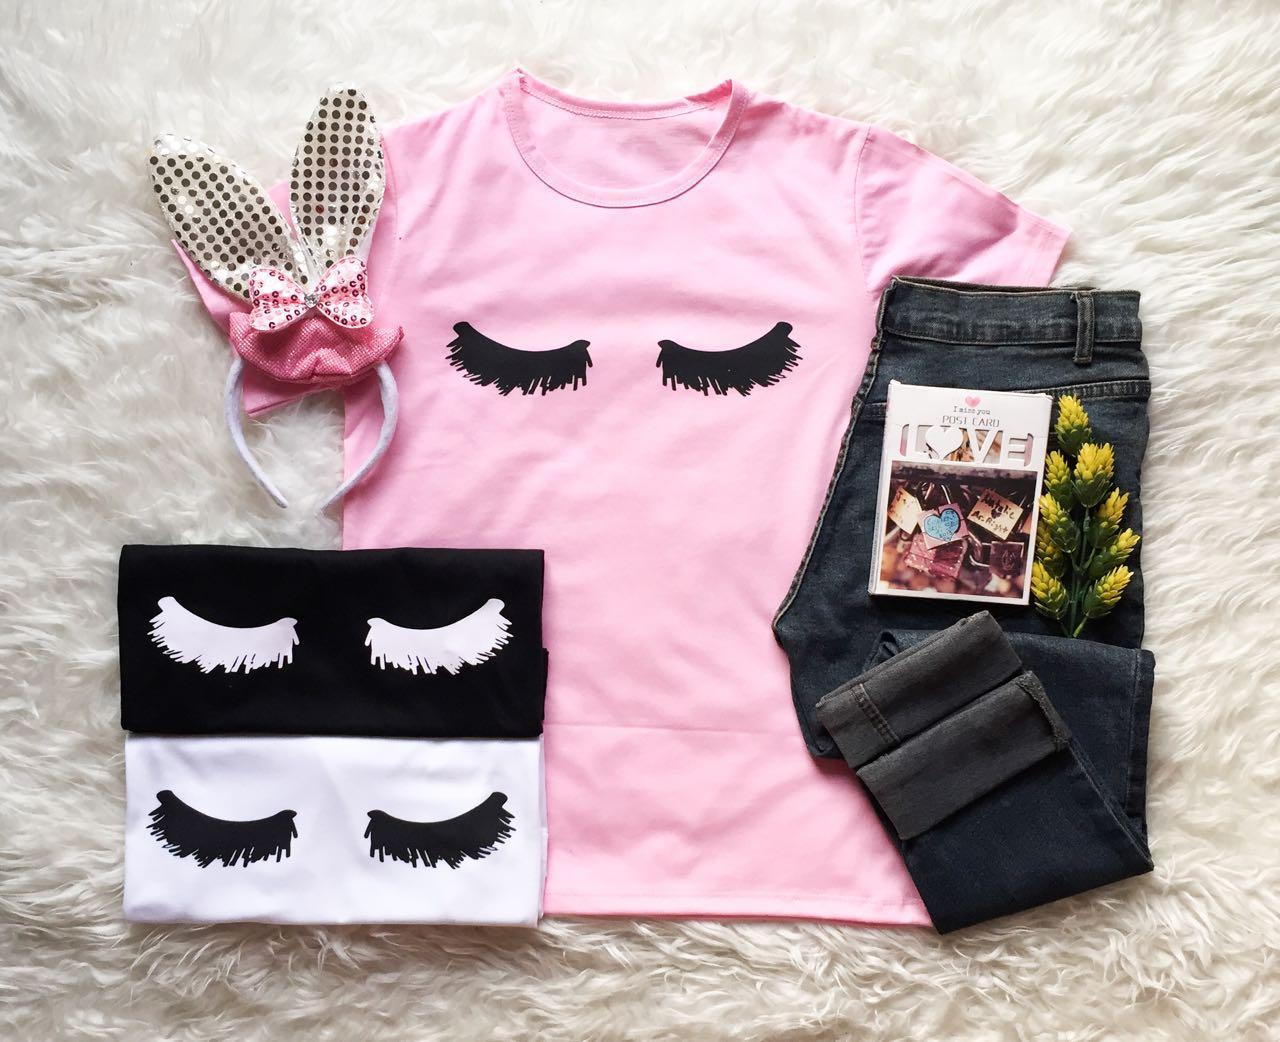 KAOS BULU MATA # HAE2403 T-shirt Wanita / Kaos Cewek / Tumblr Tee Cewek